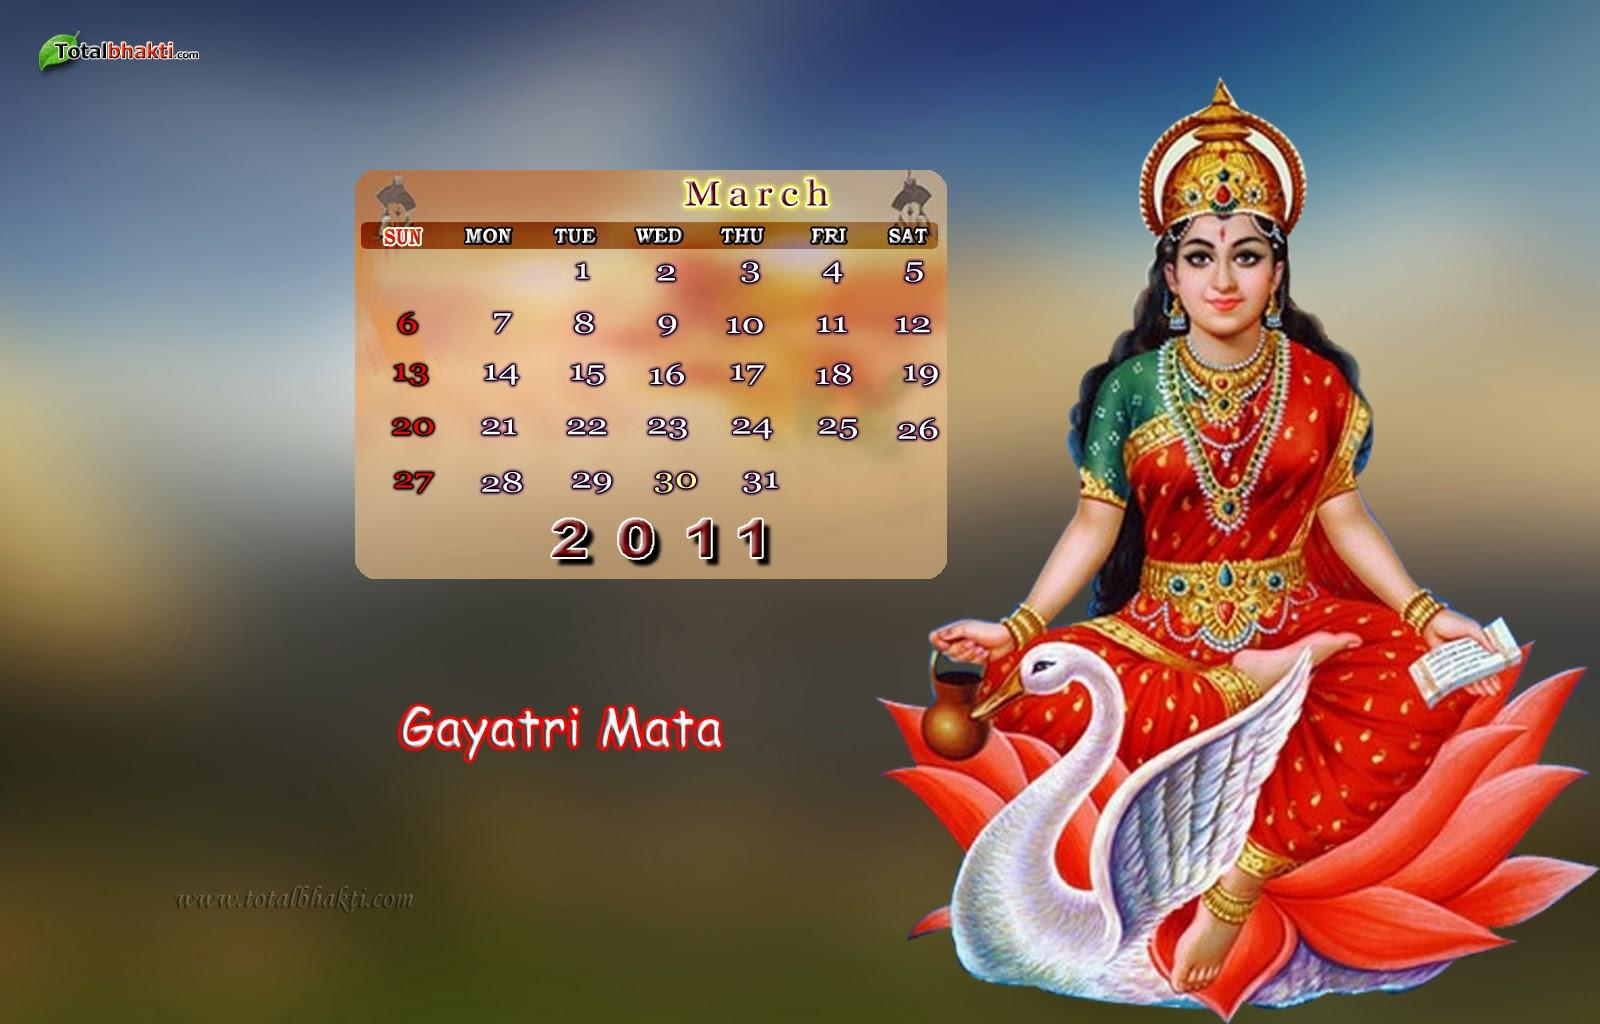 Ghanshyam Maharaj Wallpaper Hd Jay Swaminarayan Wallpapers Gayatri Maa Computer Hd